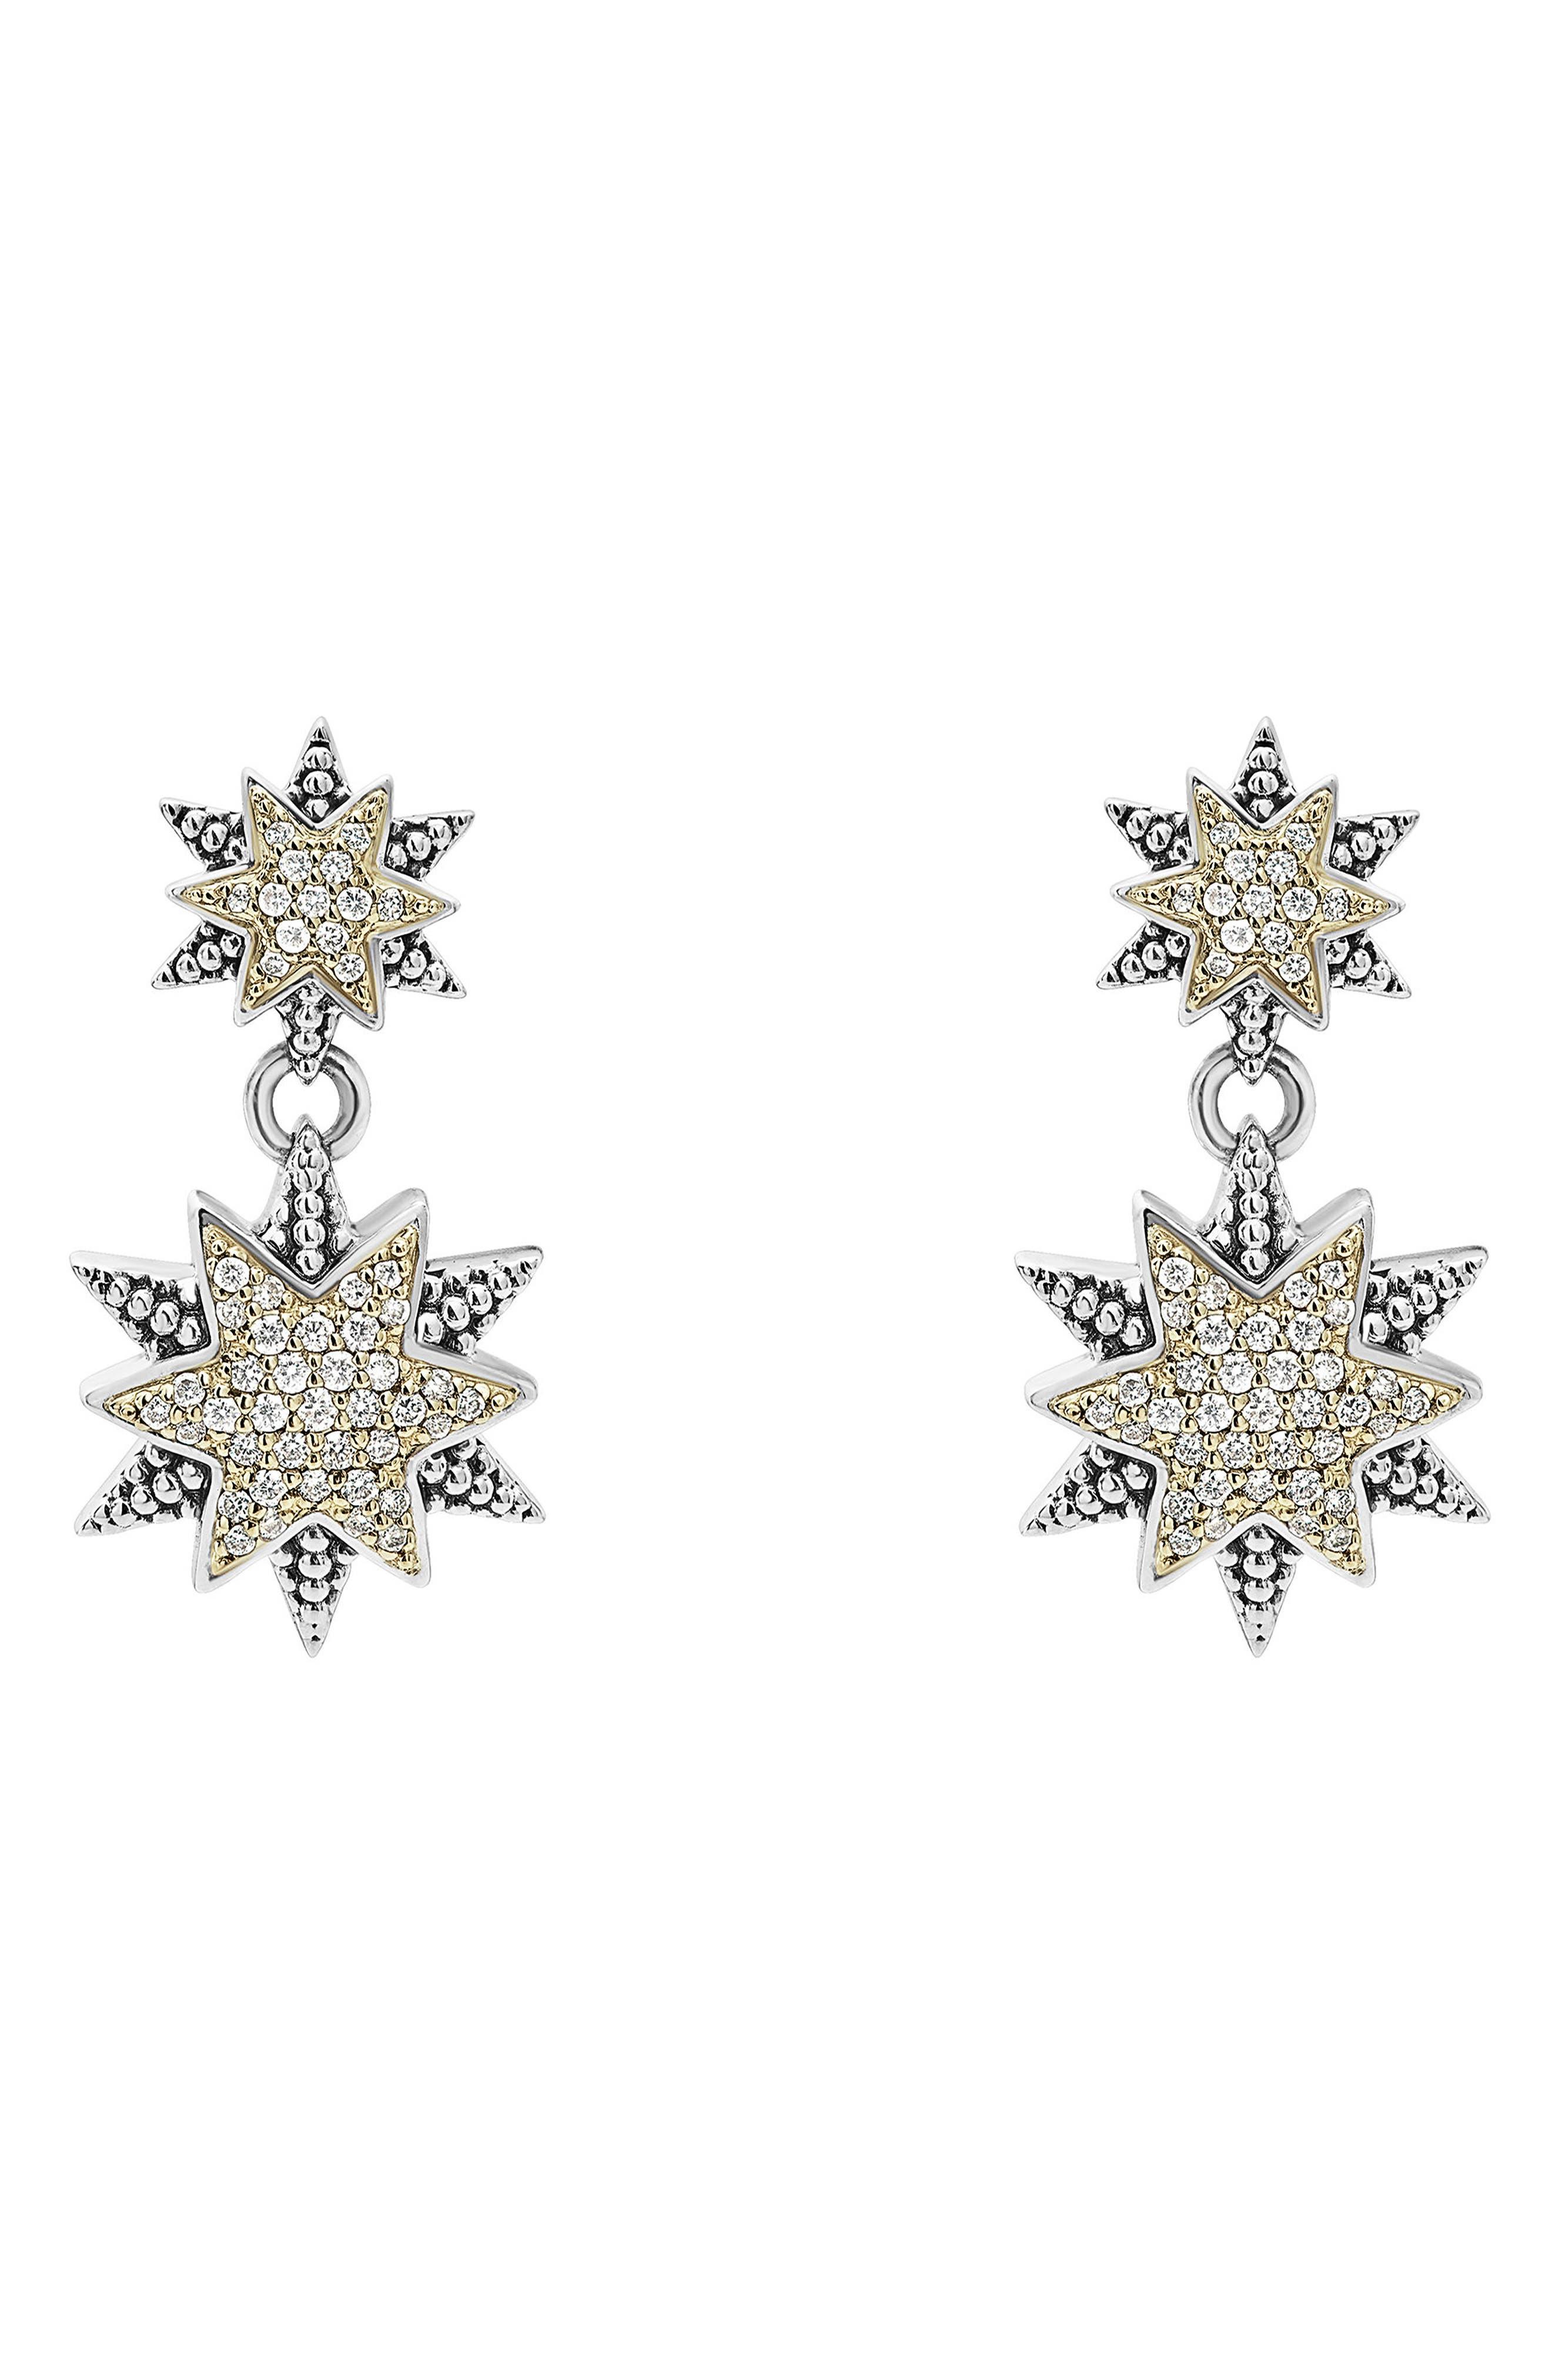 North Star Drop Earrings,                             Main thumbnail 1, color,                             Diamond